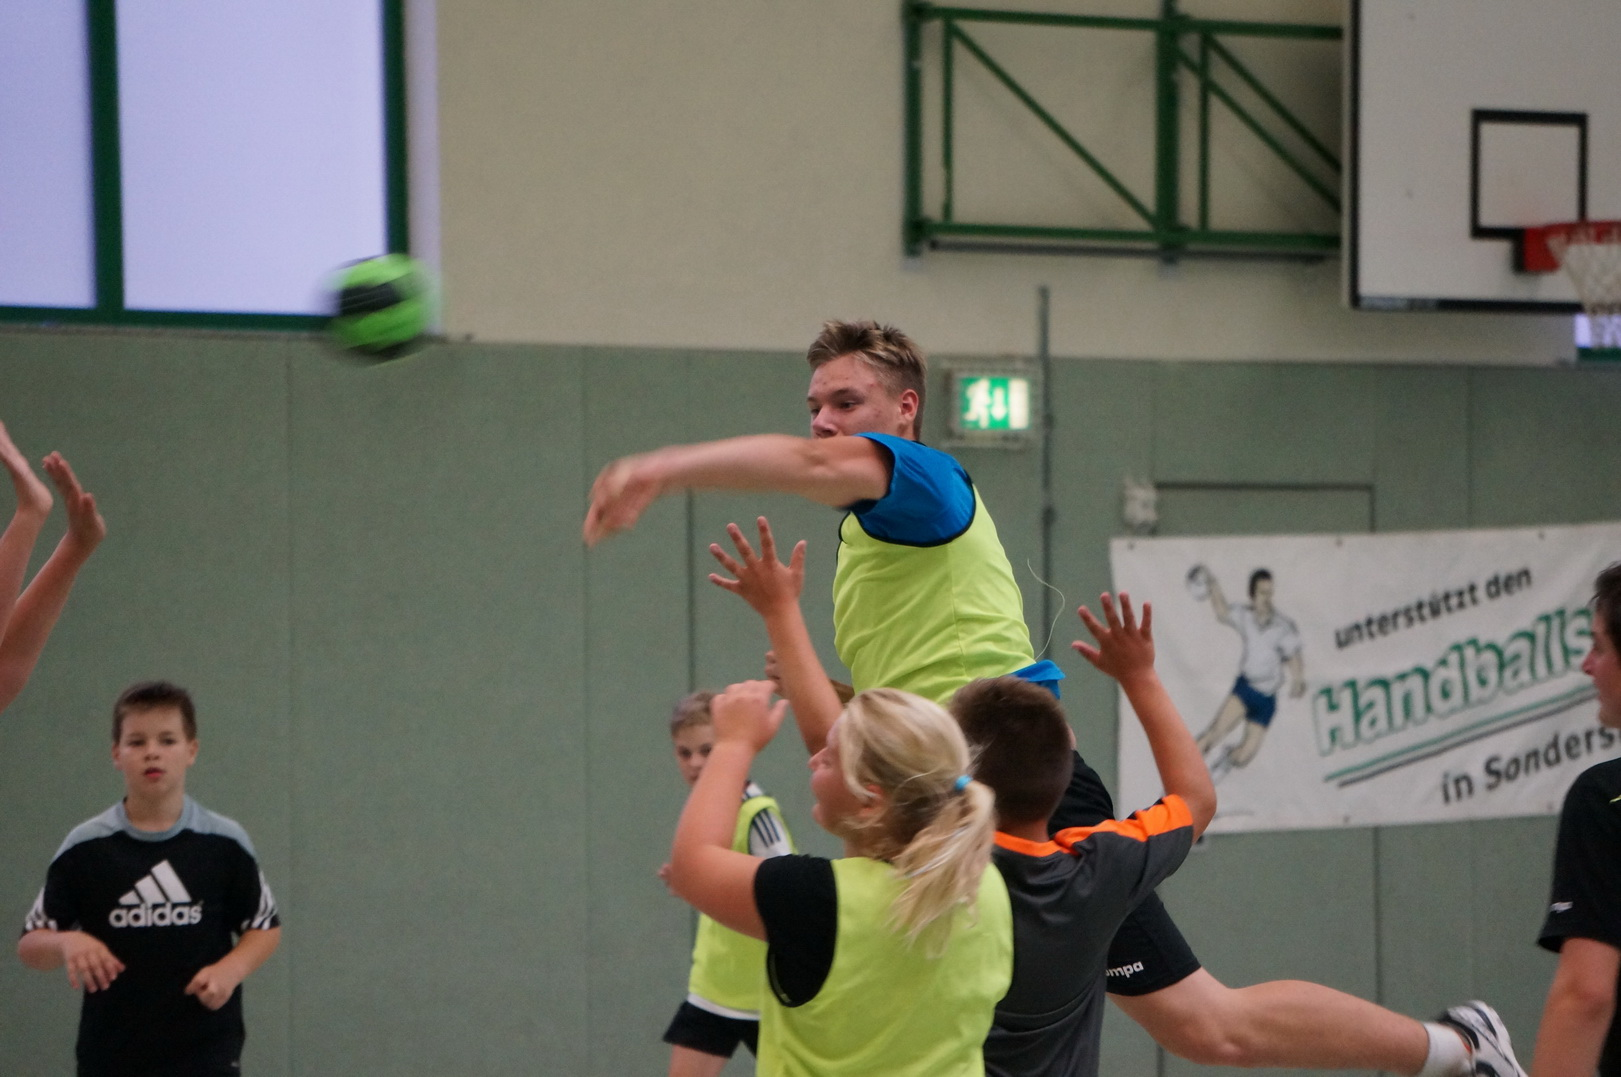 201808_Handballcamp_SDH_MG_122w